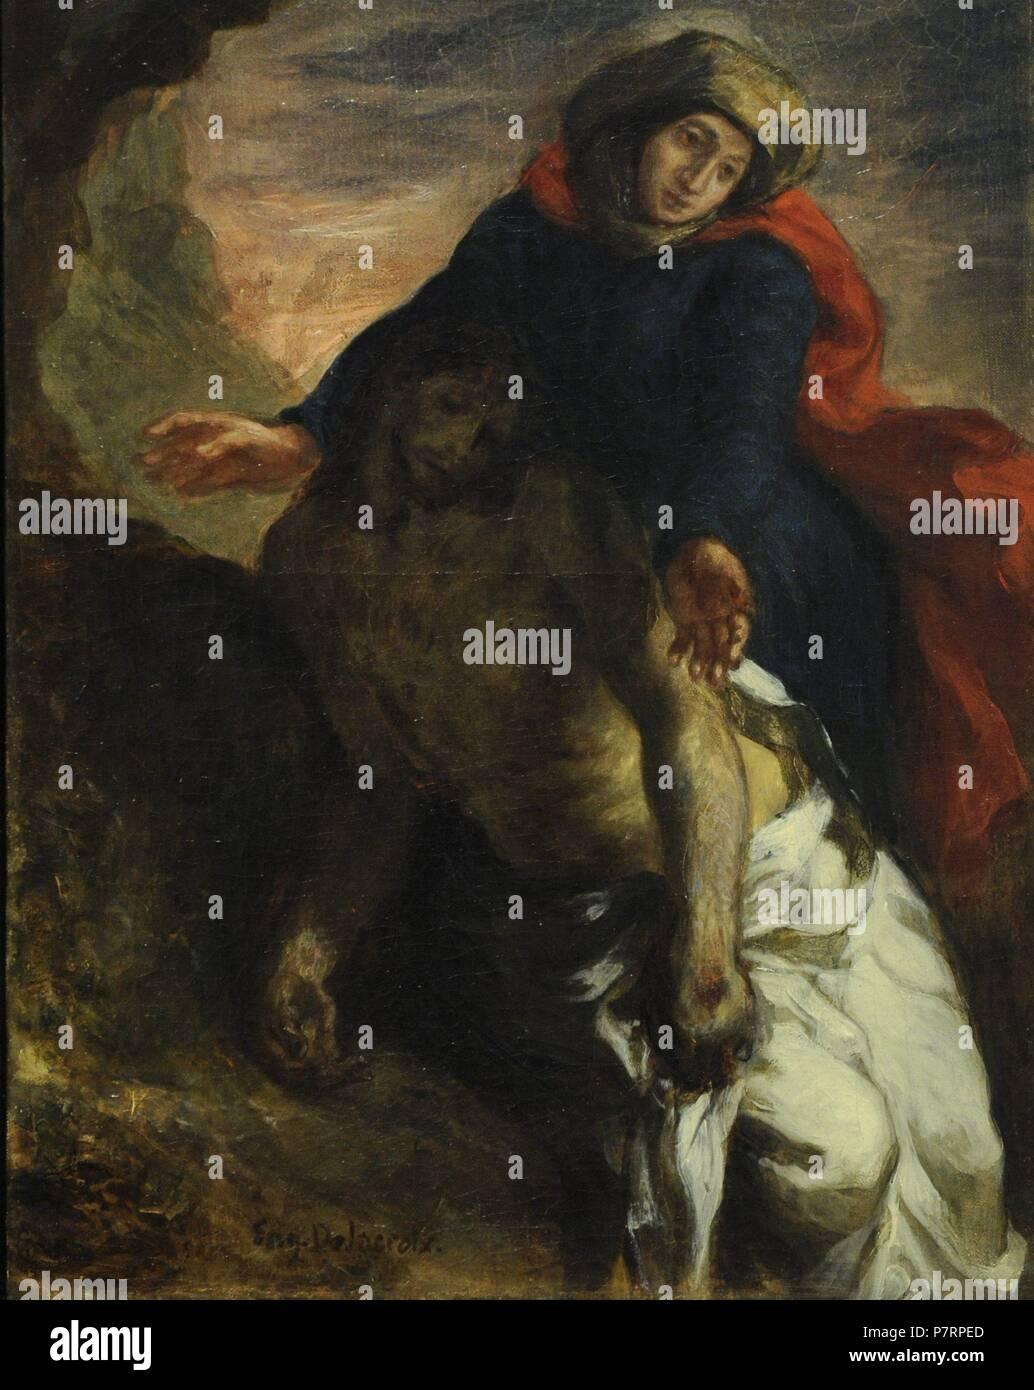 Eugene Delacroix (1798-1863). French painter. Pieta, 1850. National Museum. Stockholm. Sweden. Stock Photo